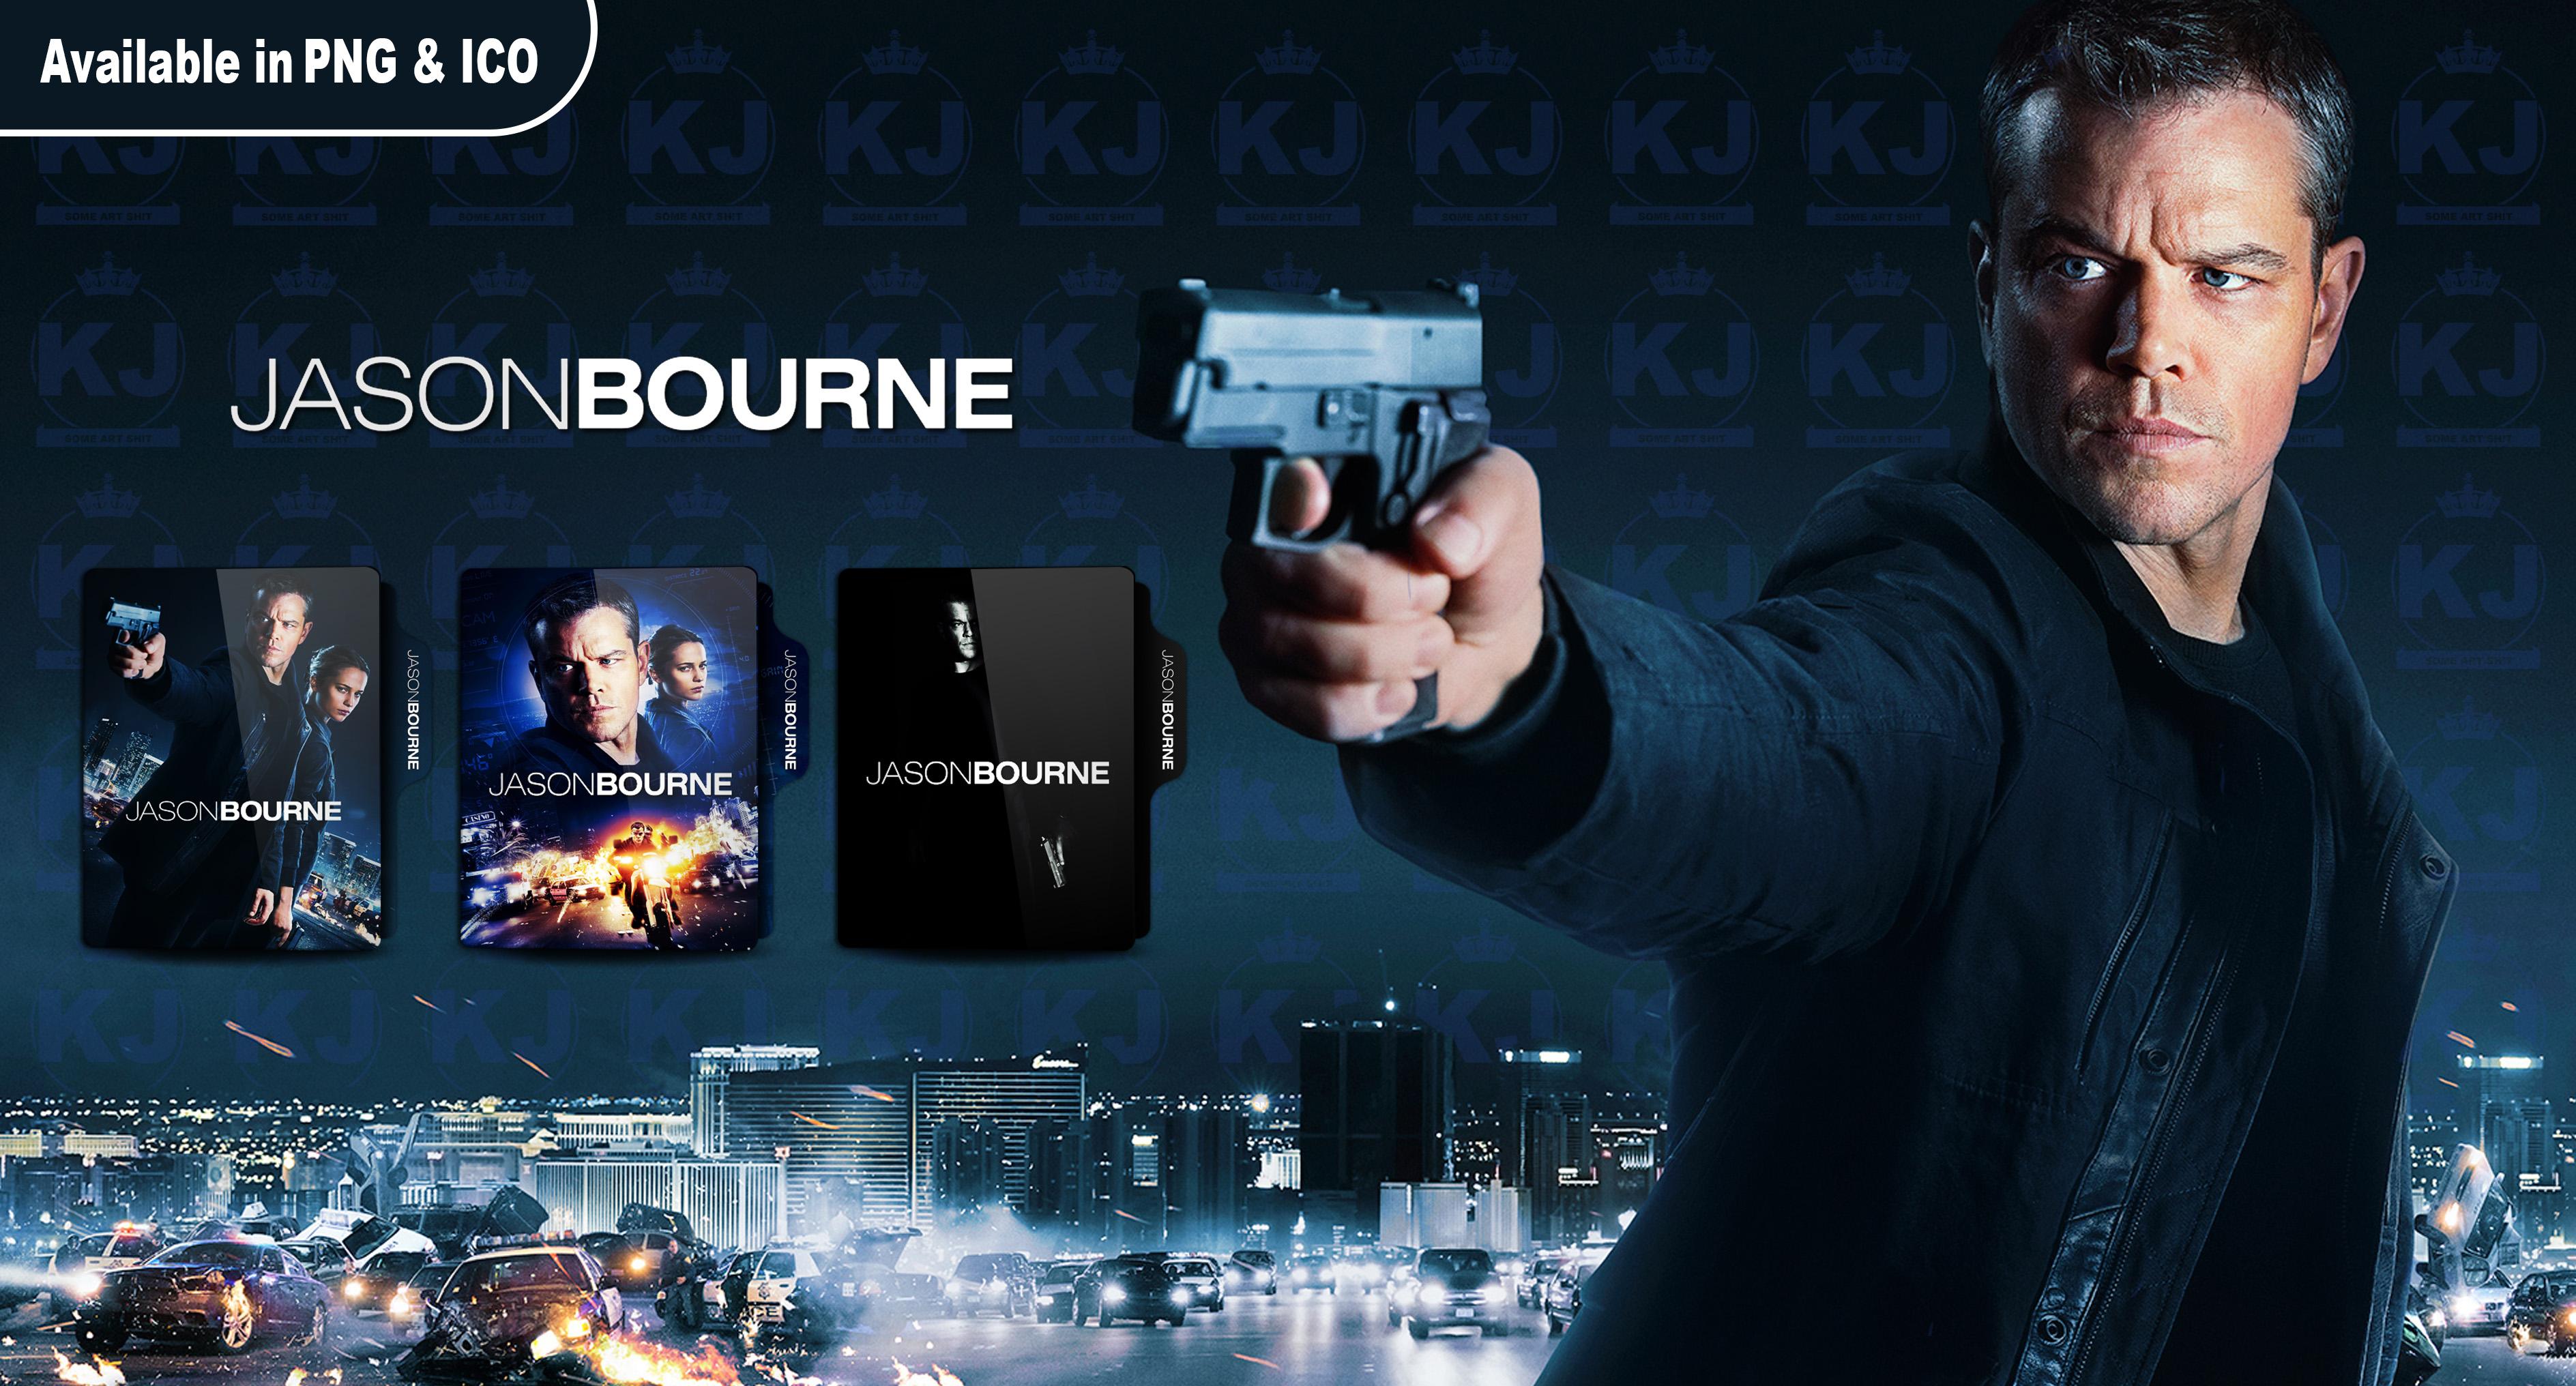 Jason Bourne 2016 By Kingjoe93 On Deviantart